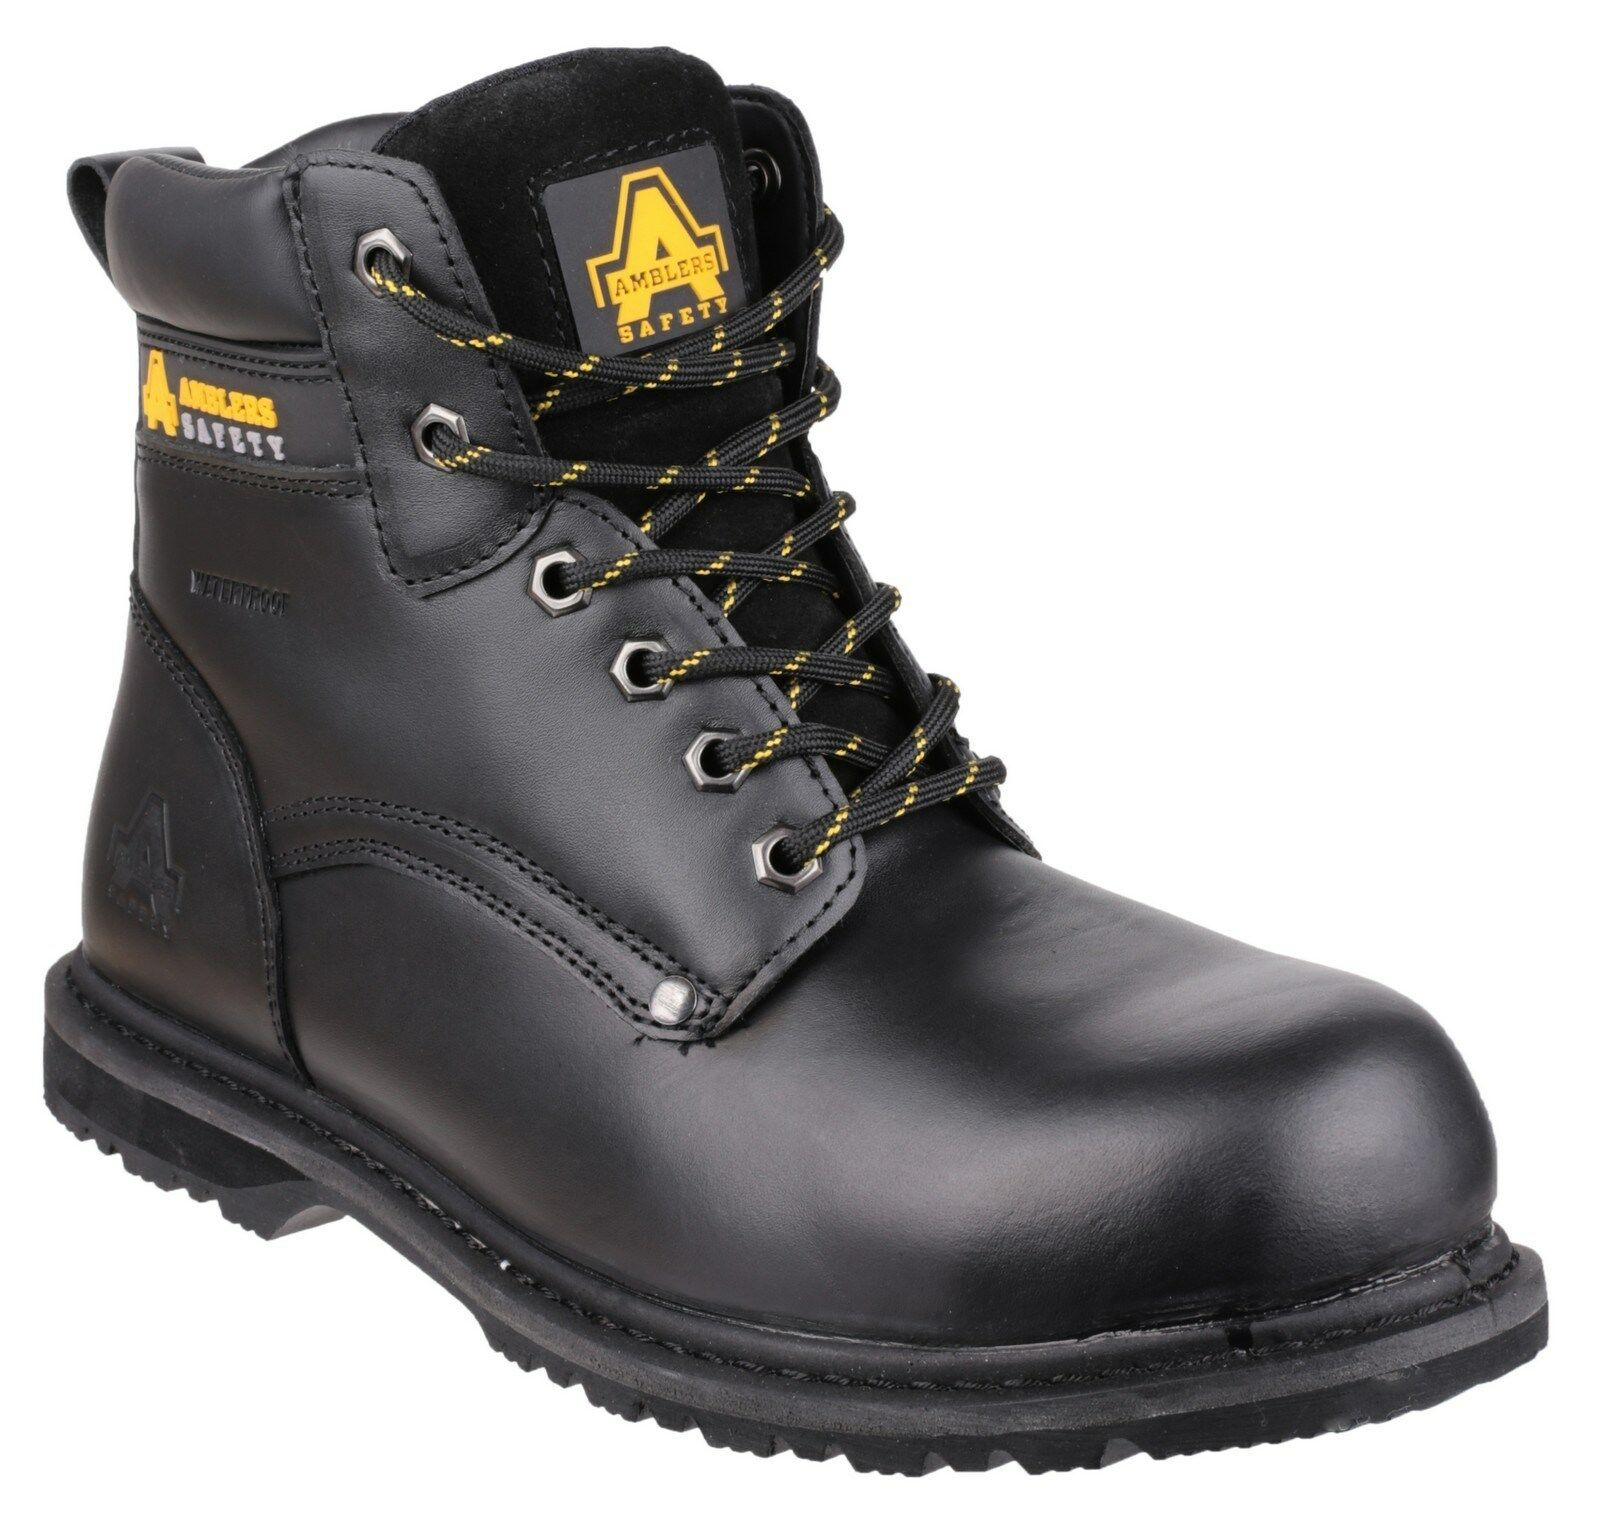 Amblers FS146 S3 Safety Boots Mens Waterproof Lightweight Steel Toe Cap Work